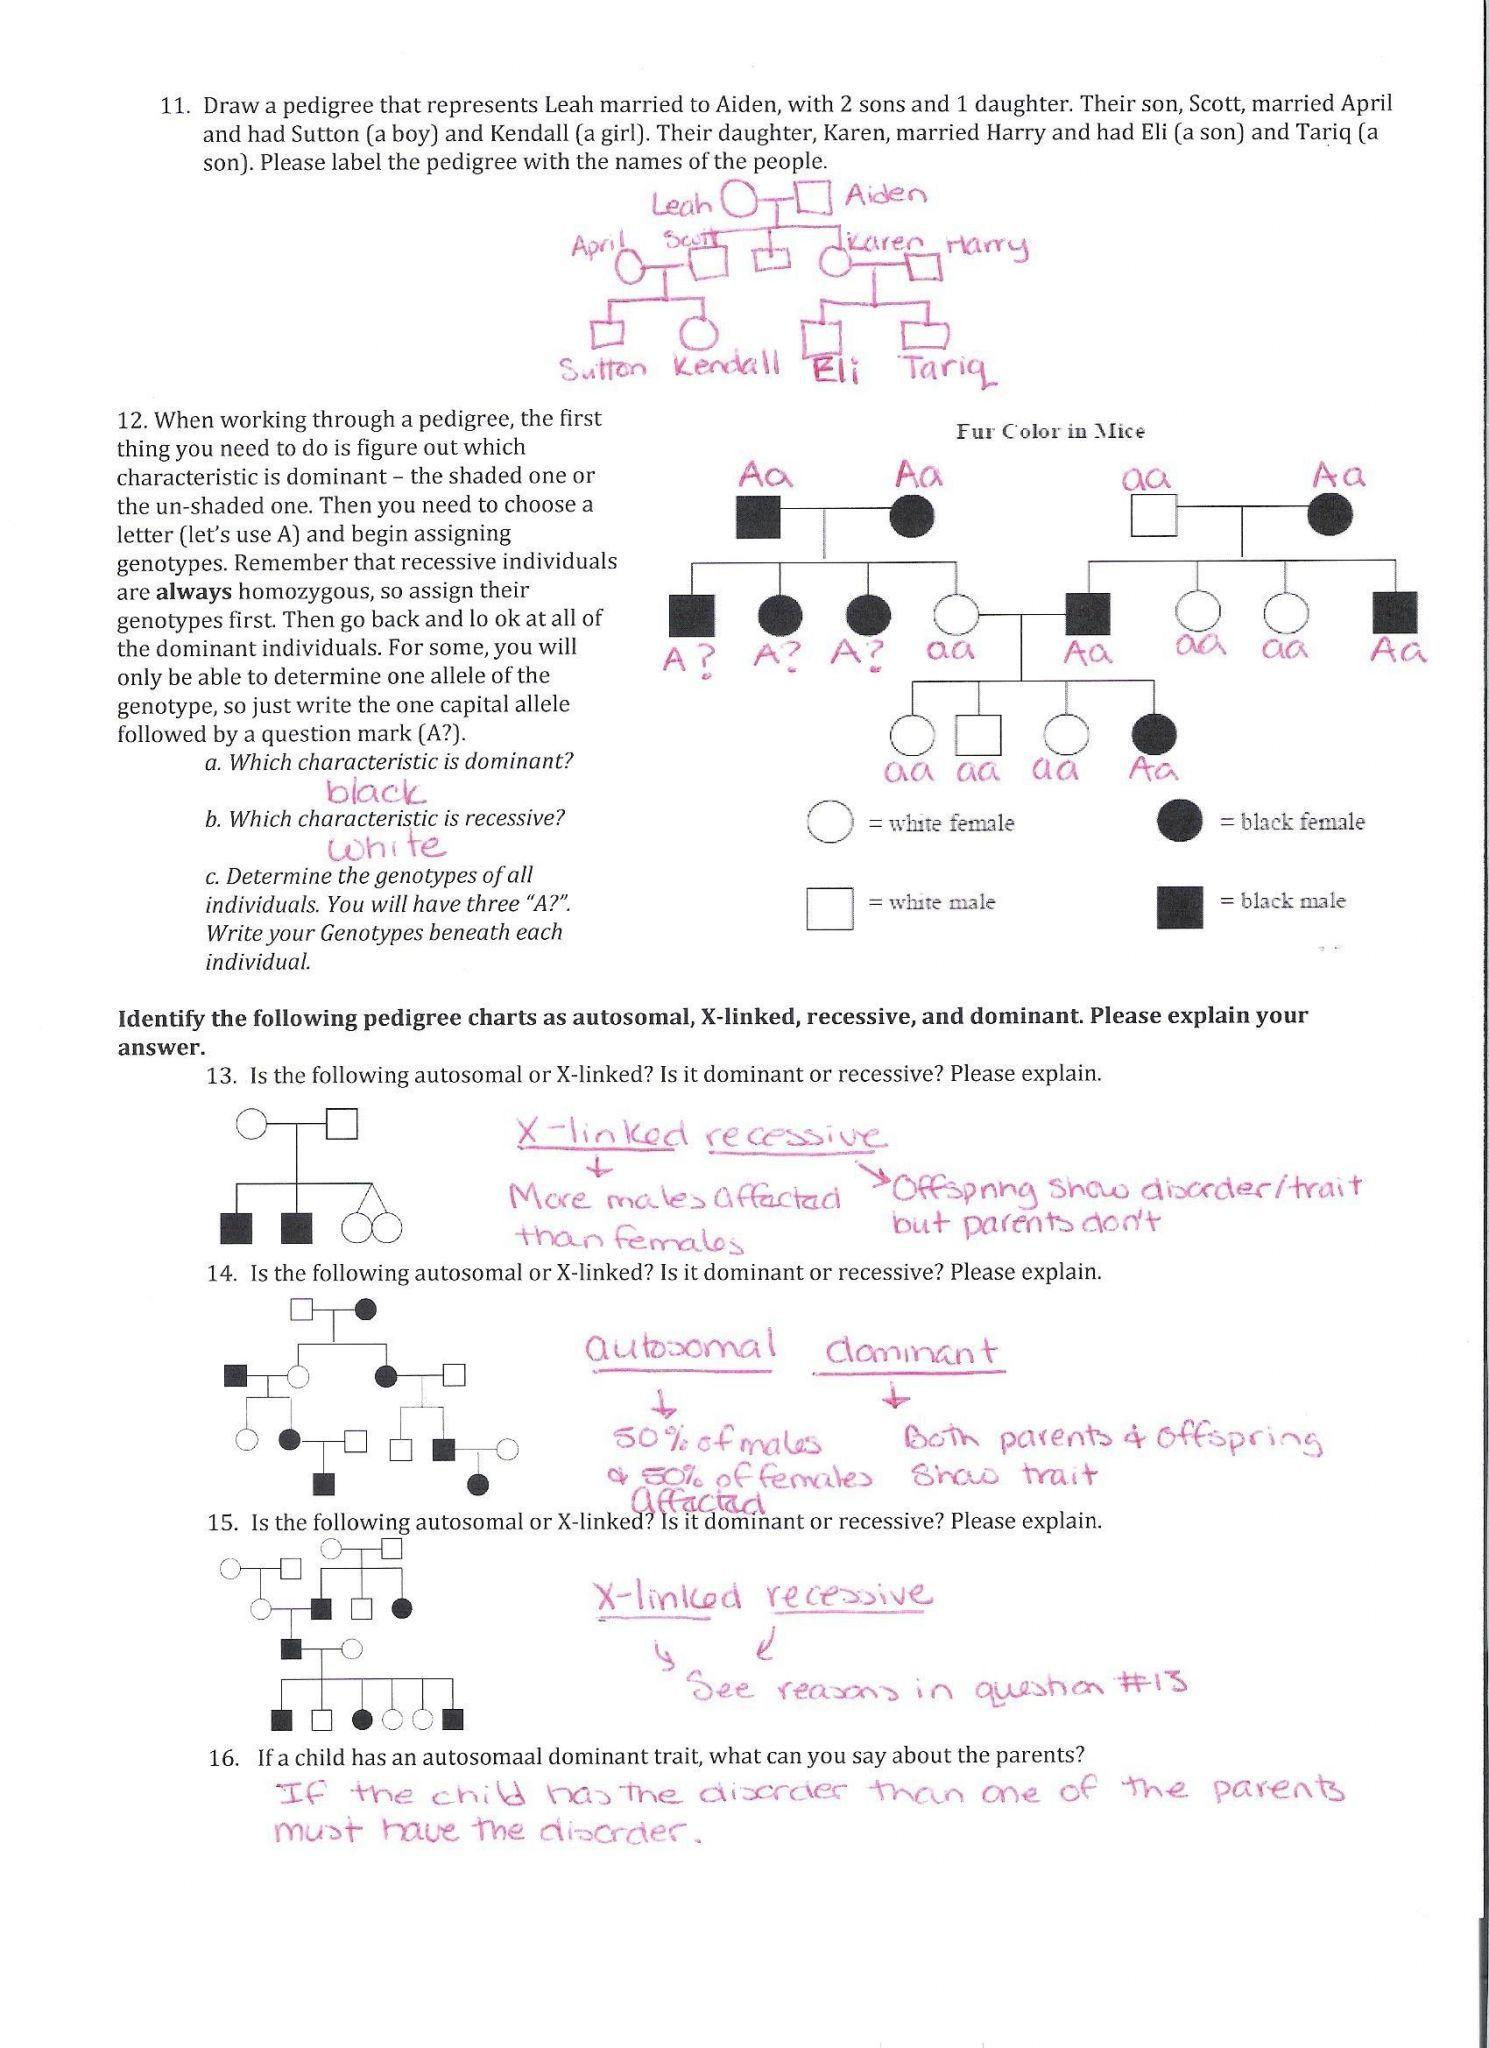 Genetics Worksheet Answer Key | Education Template